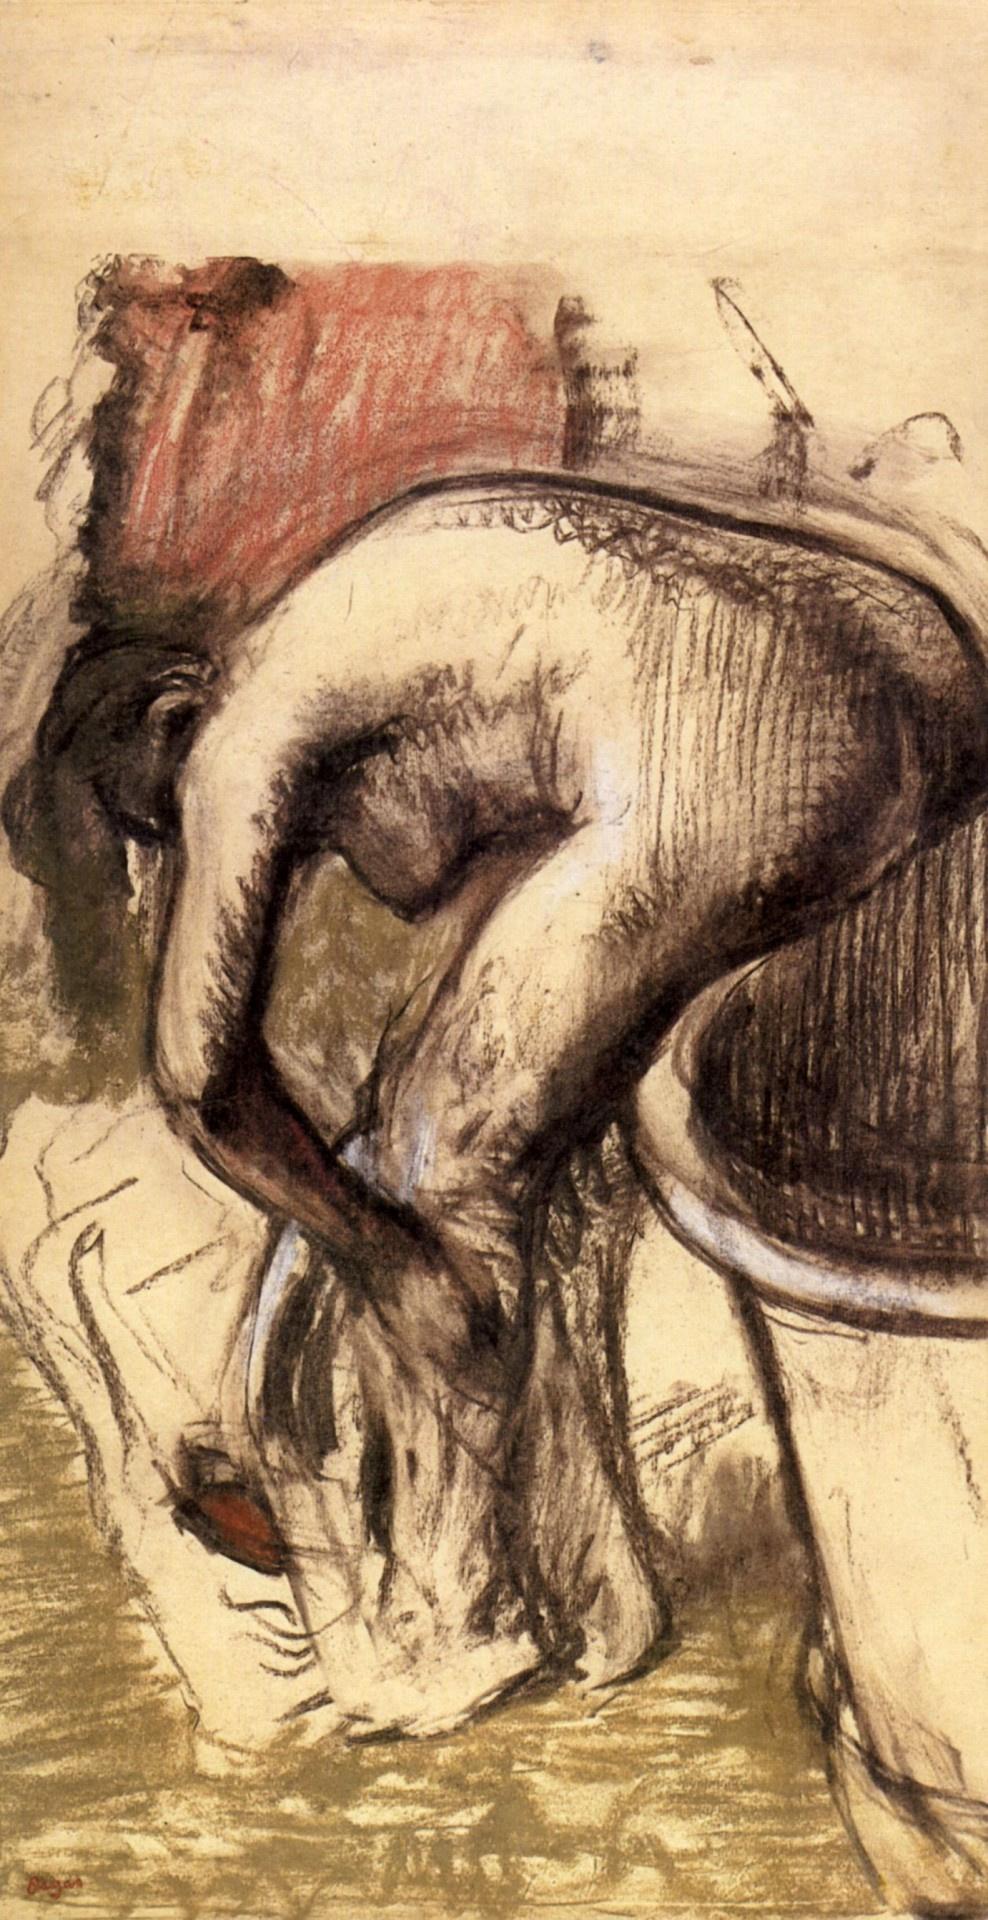 Edgar Degas. Nude on the edge of the bathtub, wiping his feet